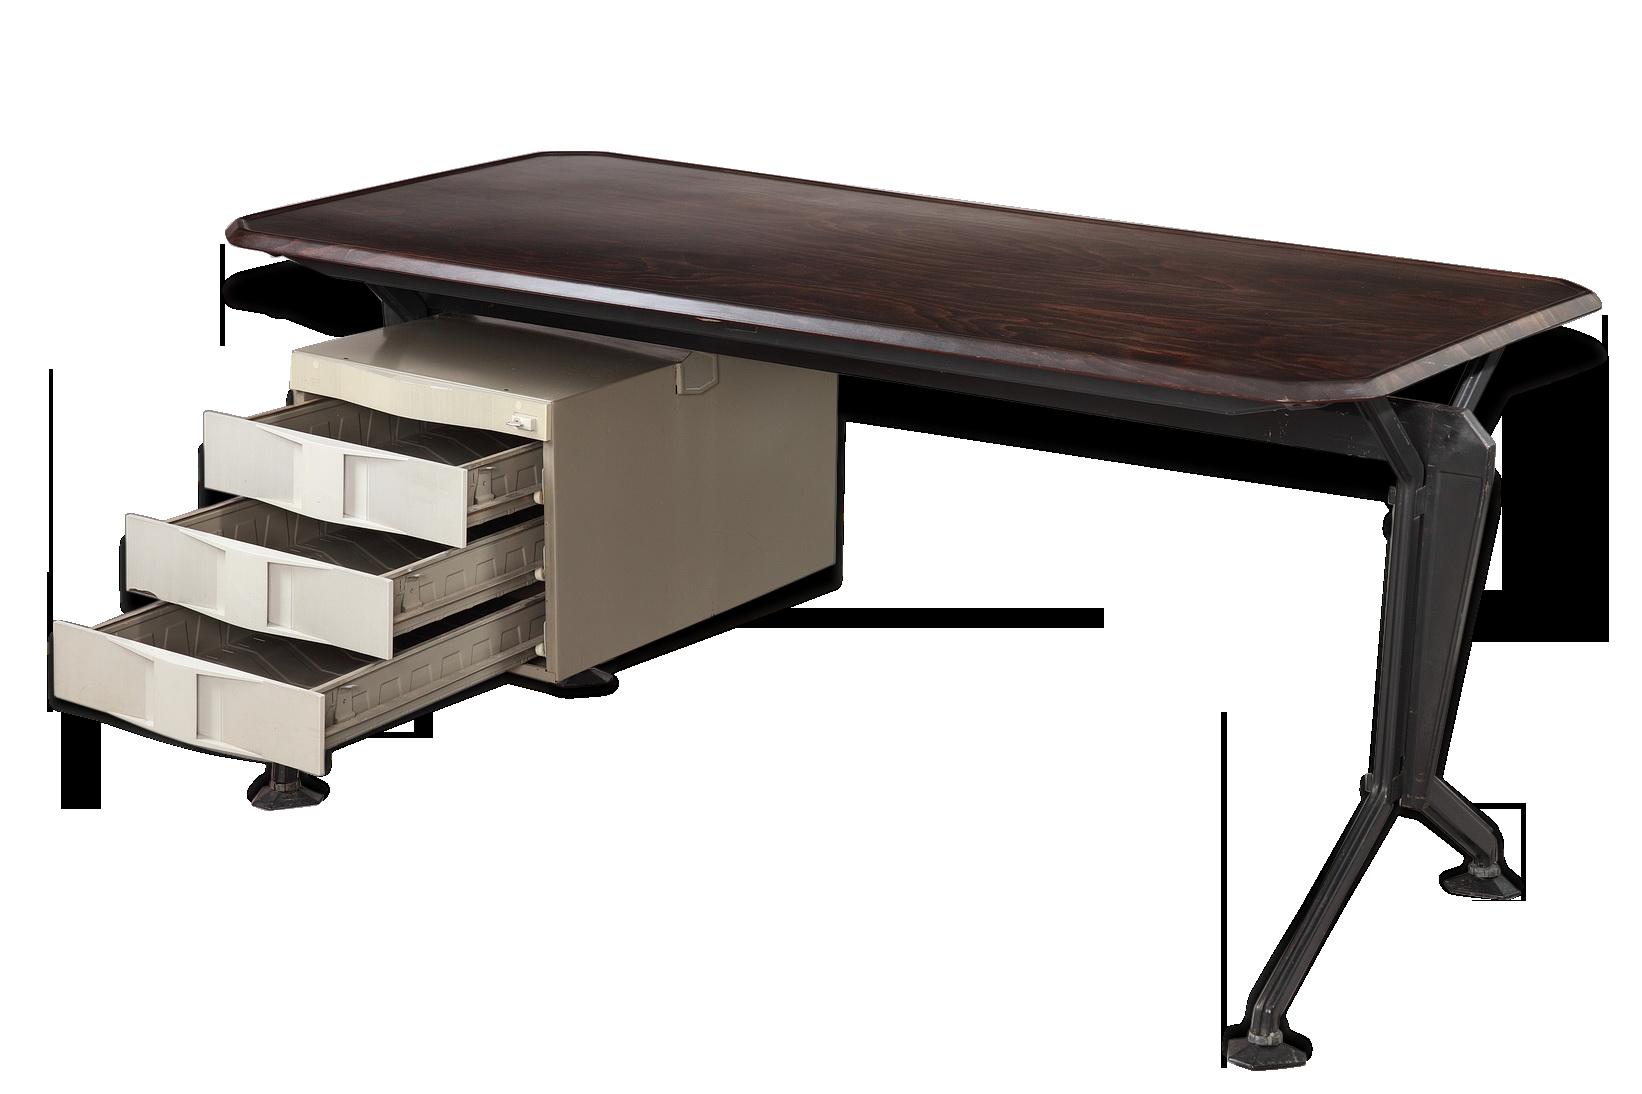 Bureau arco studio bbpr pour olivetti bois matériau design